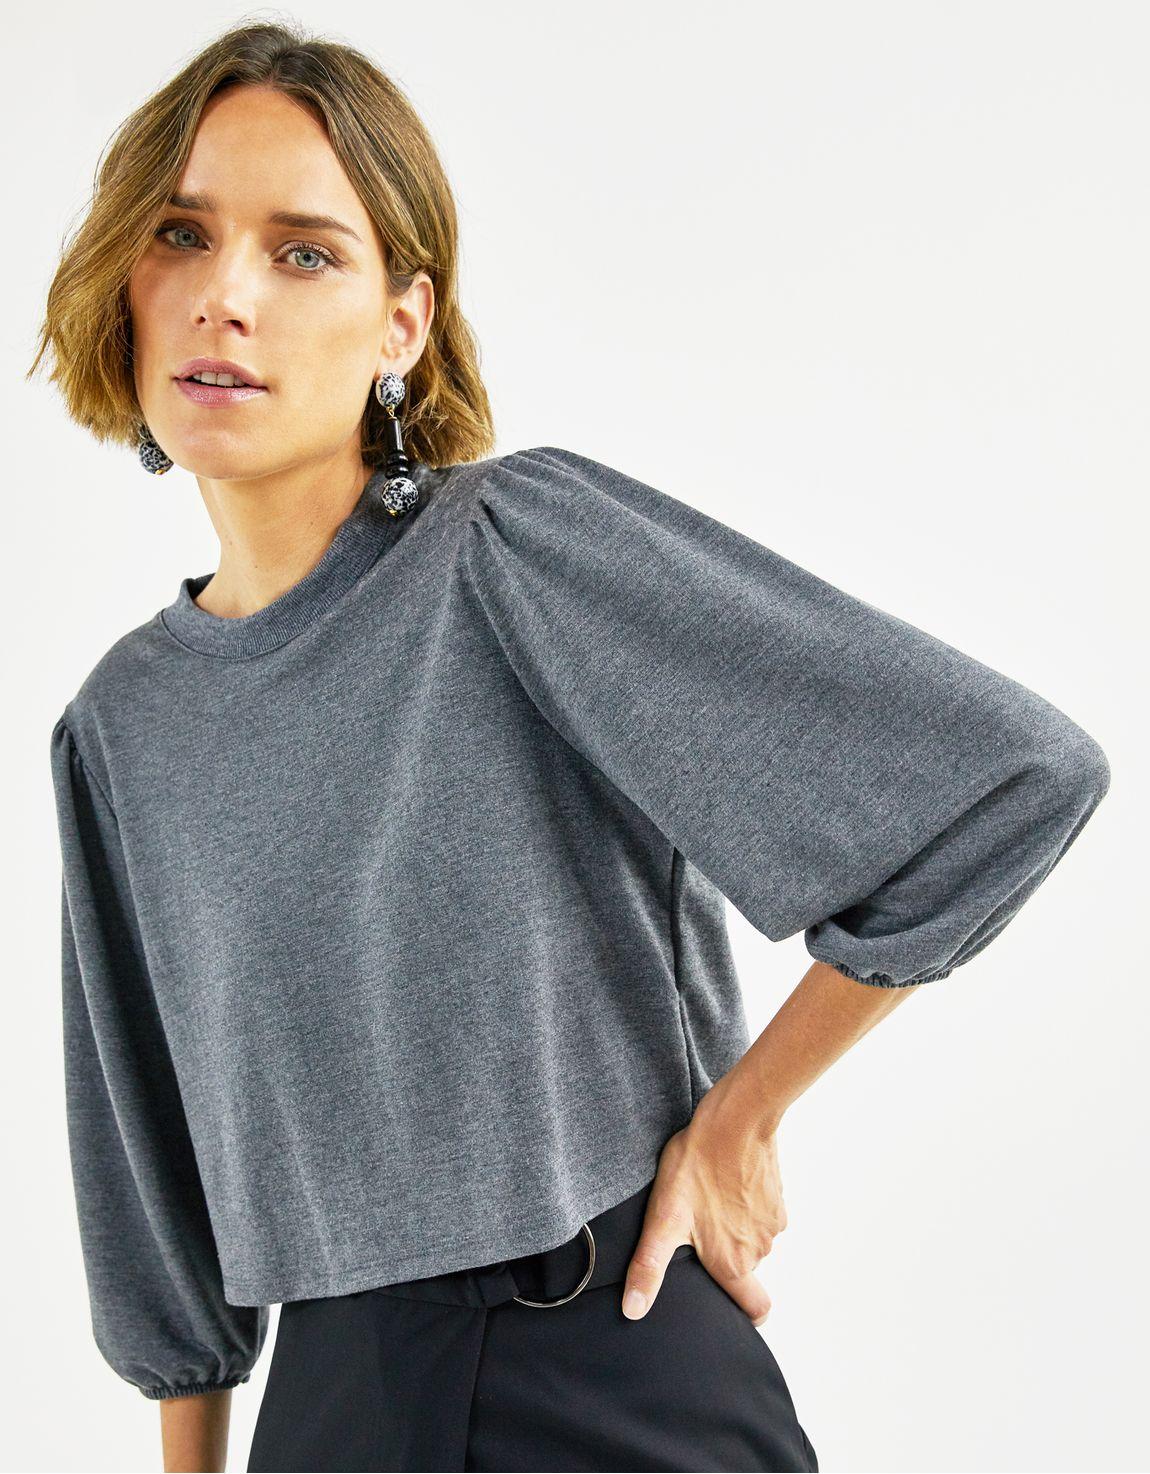 Blusa malha franzido manga